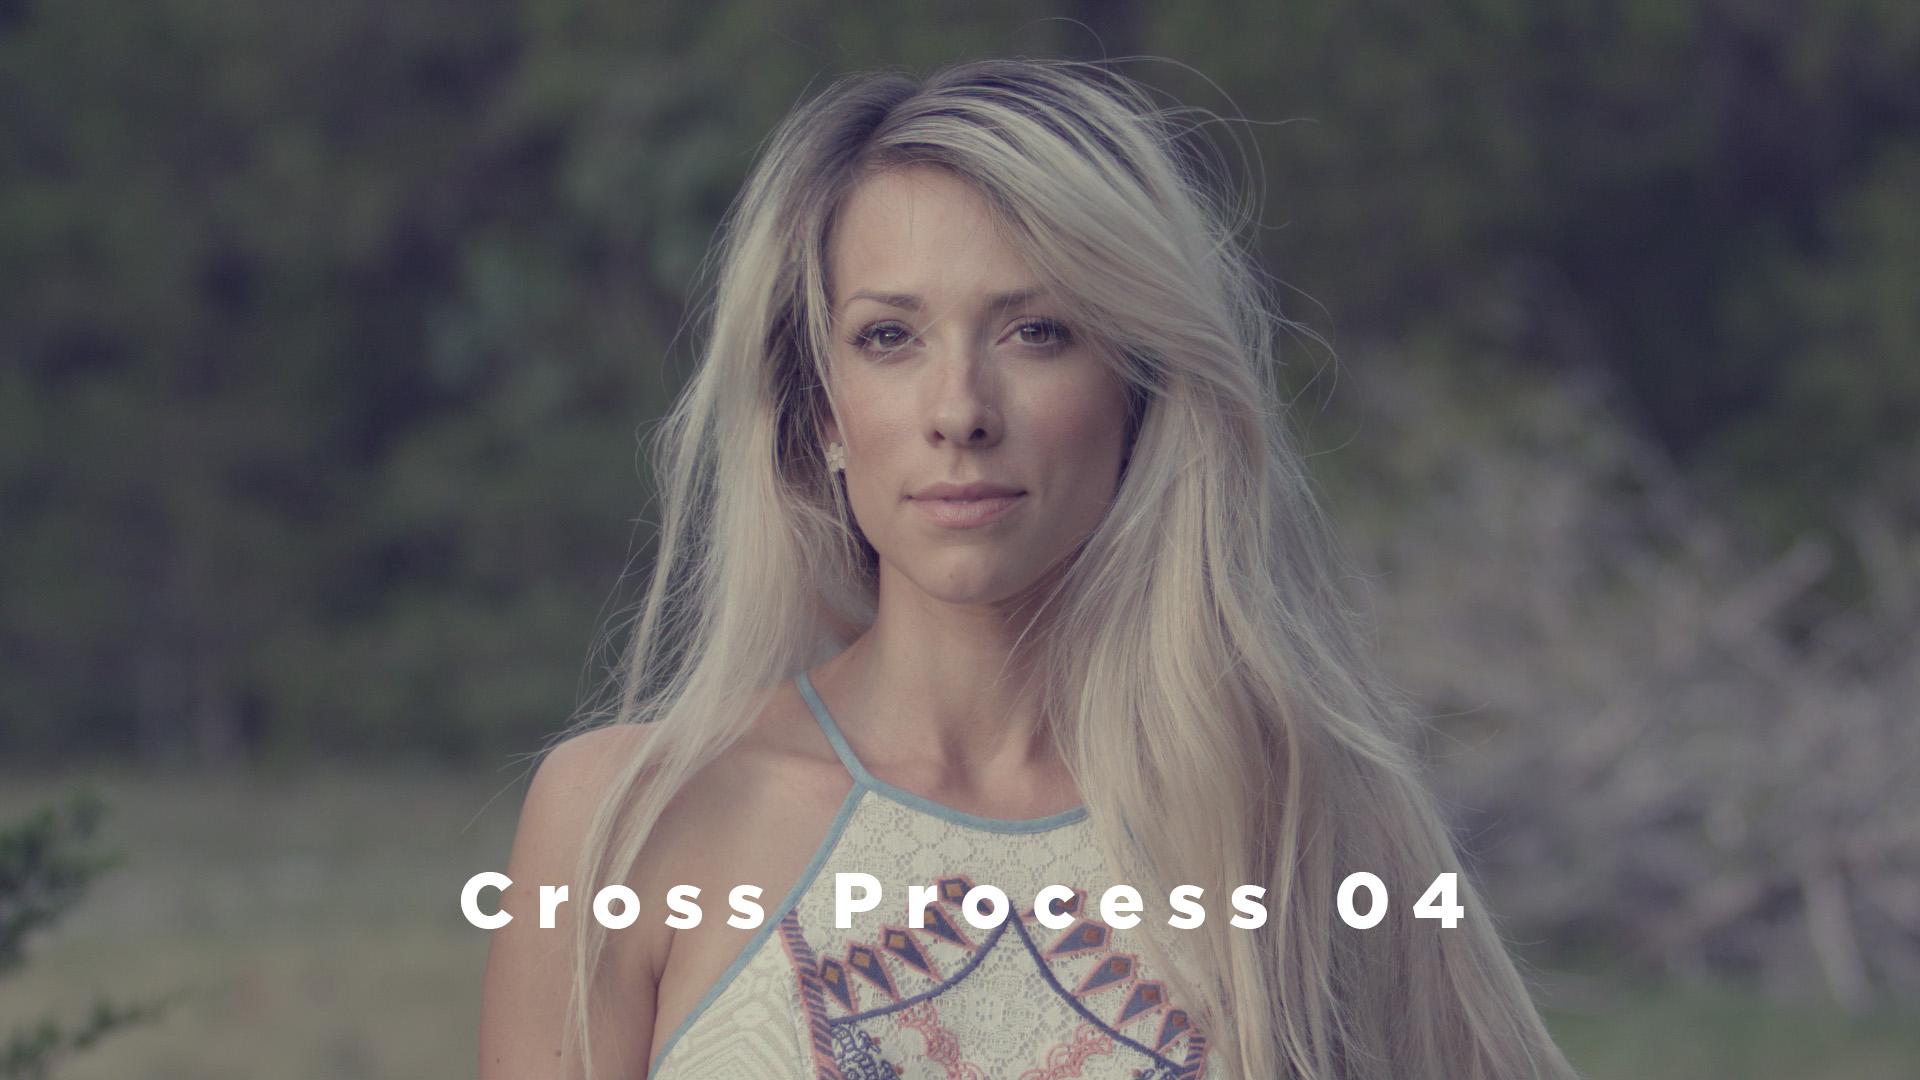 Cross Process 04.jpg